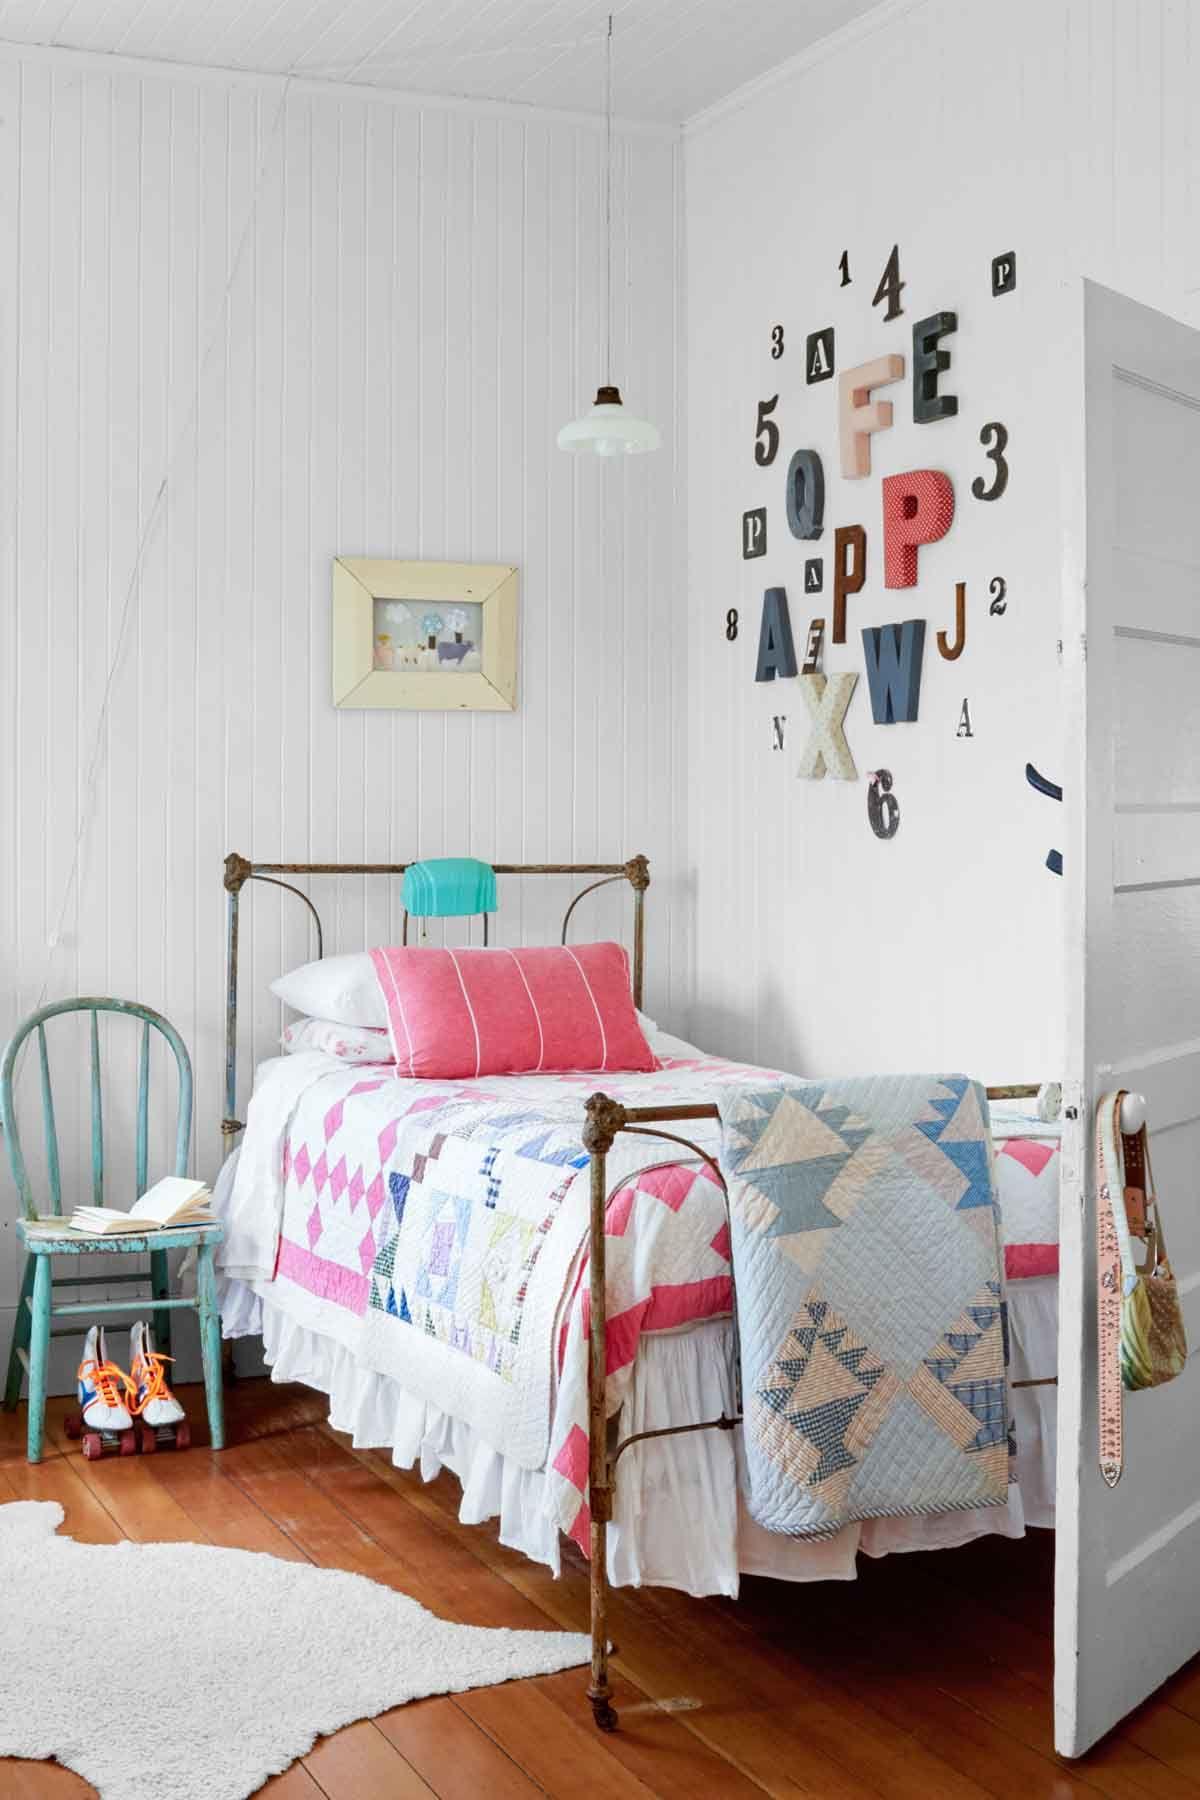 girl bedroom ideas & 12 Fun Girlu0027s Bedroom Decor Ideas - Cute Room Decorating for Girls